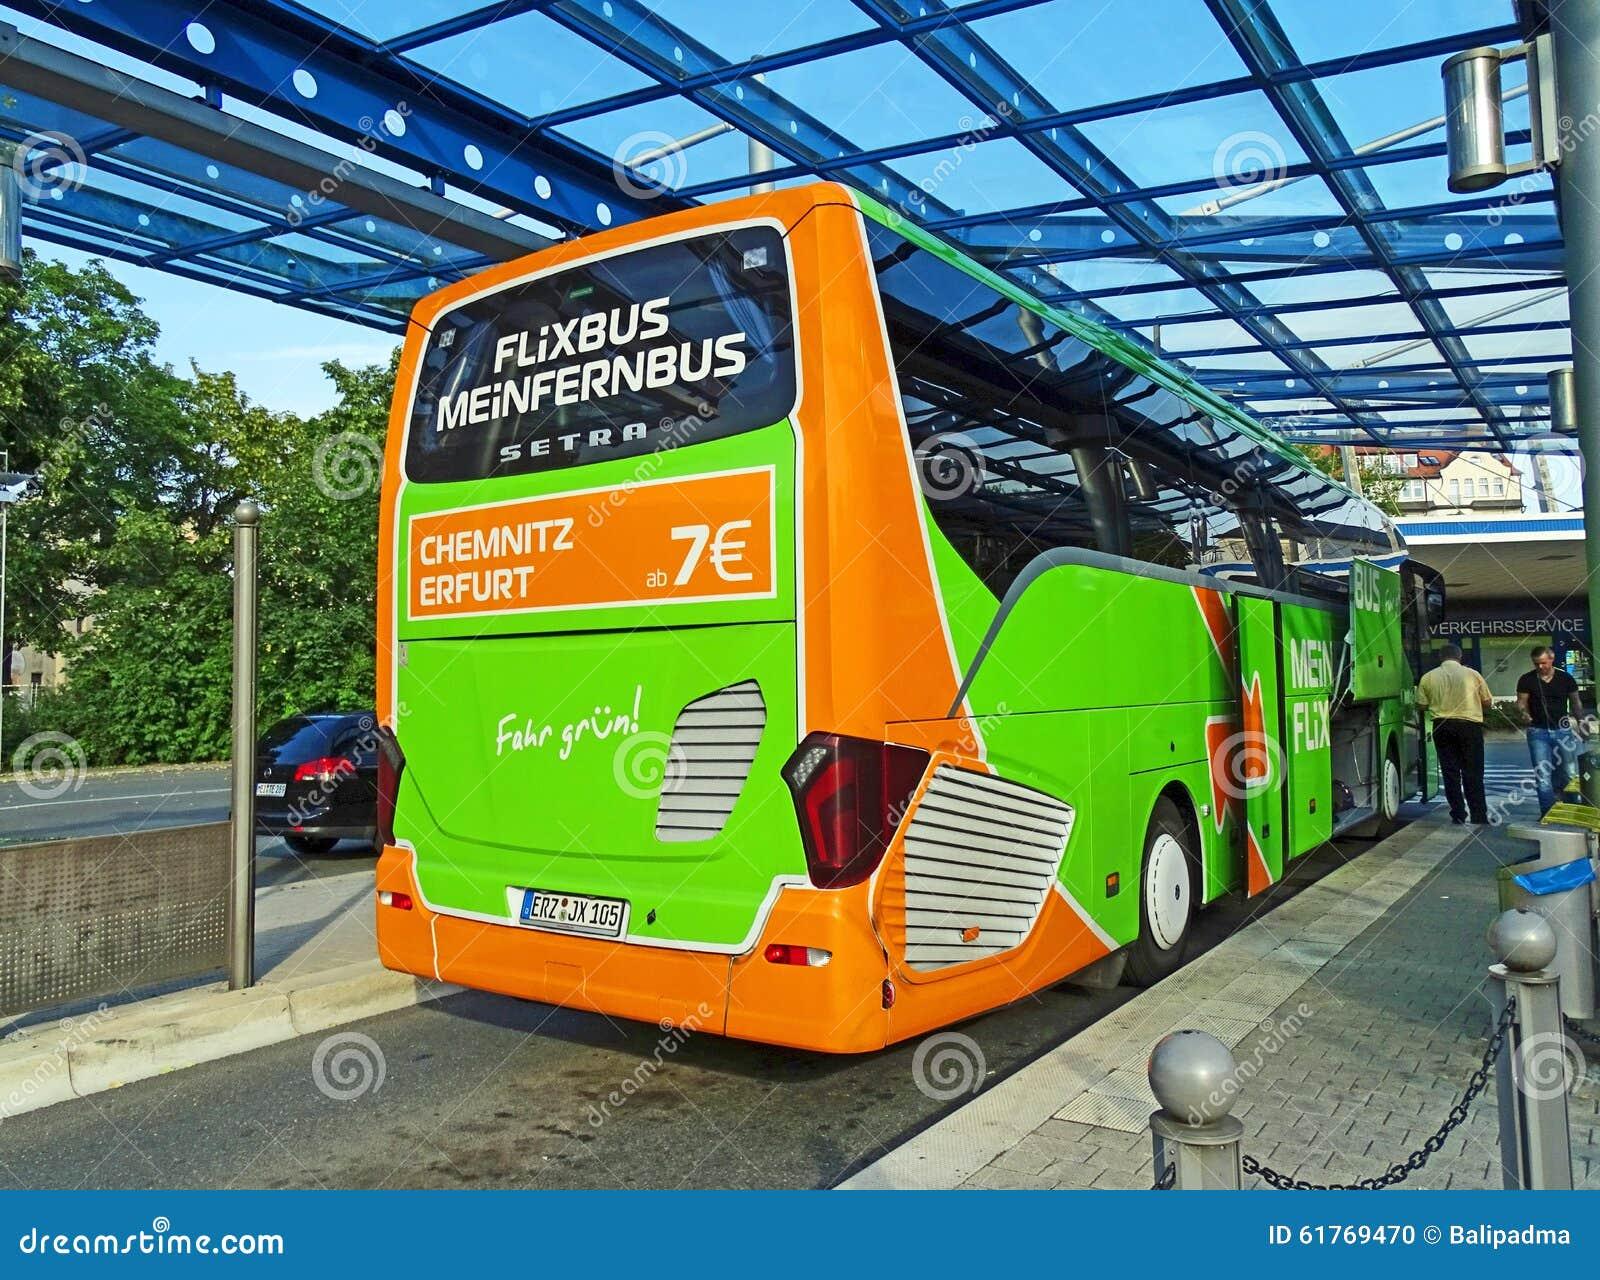 coach of meinfernbus flixbus in chemnitz editorial image image 61769470. Black Bedroom Furniture Sets. Home Design Ideas